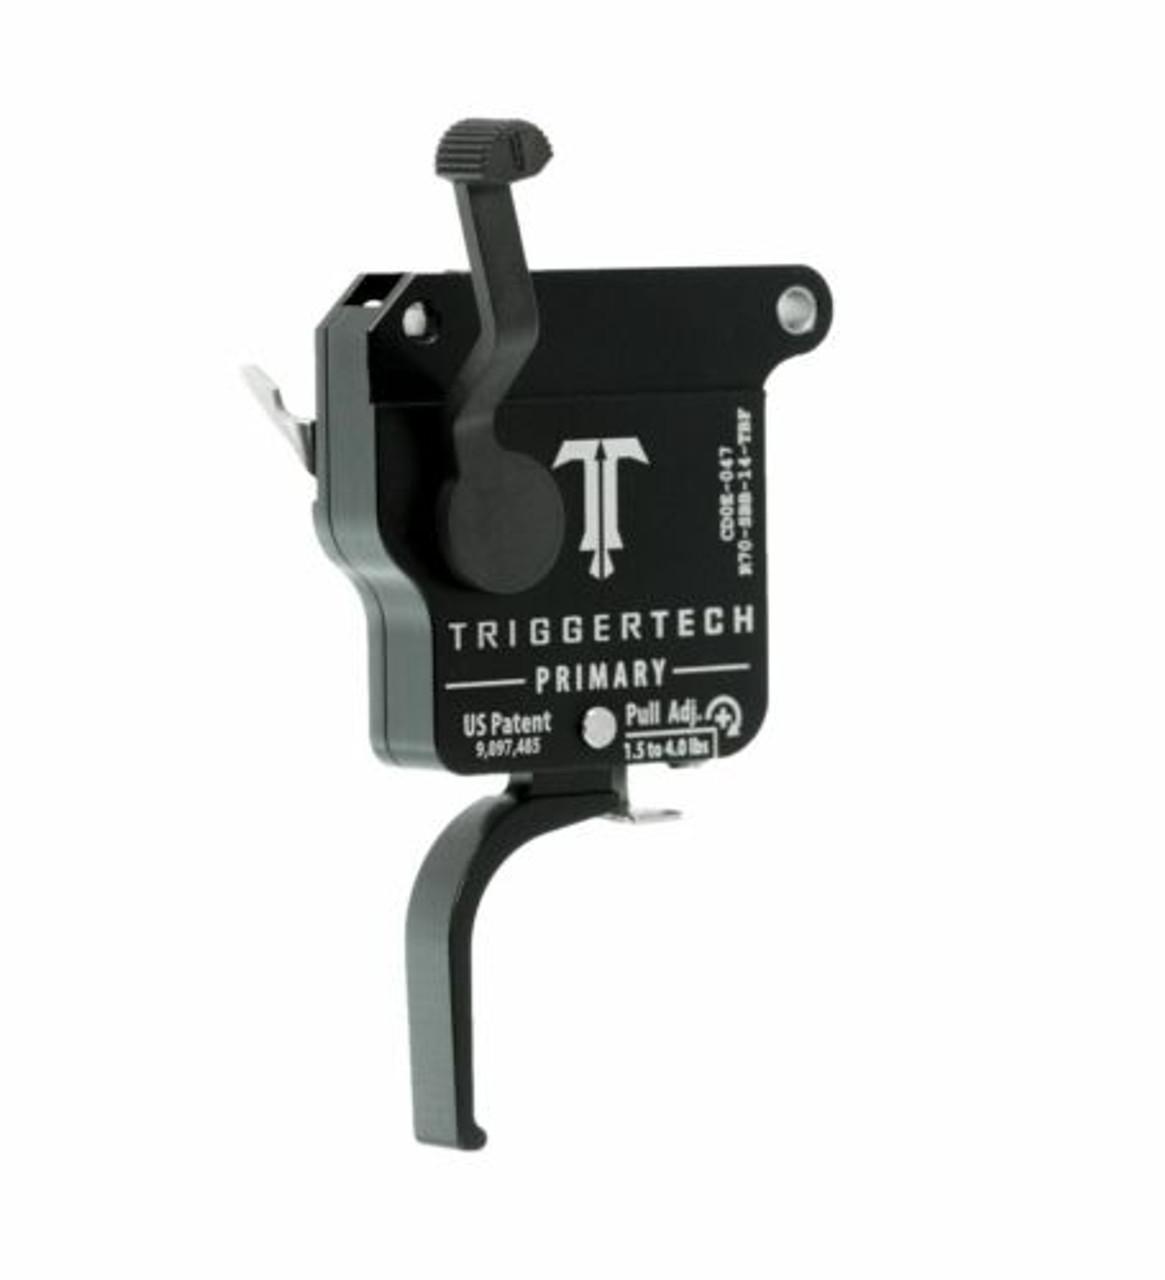 TriggerTech Remington 700 Single Stage Primary Flat, Straight Flat PVD Black Trigger